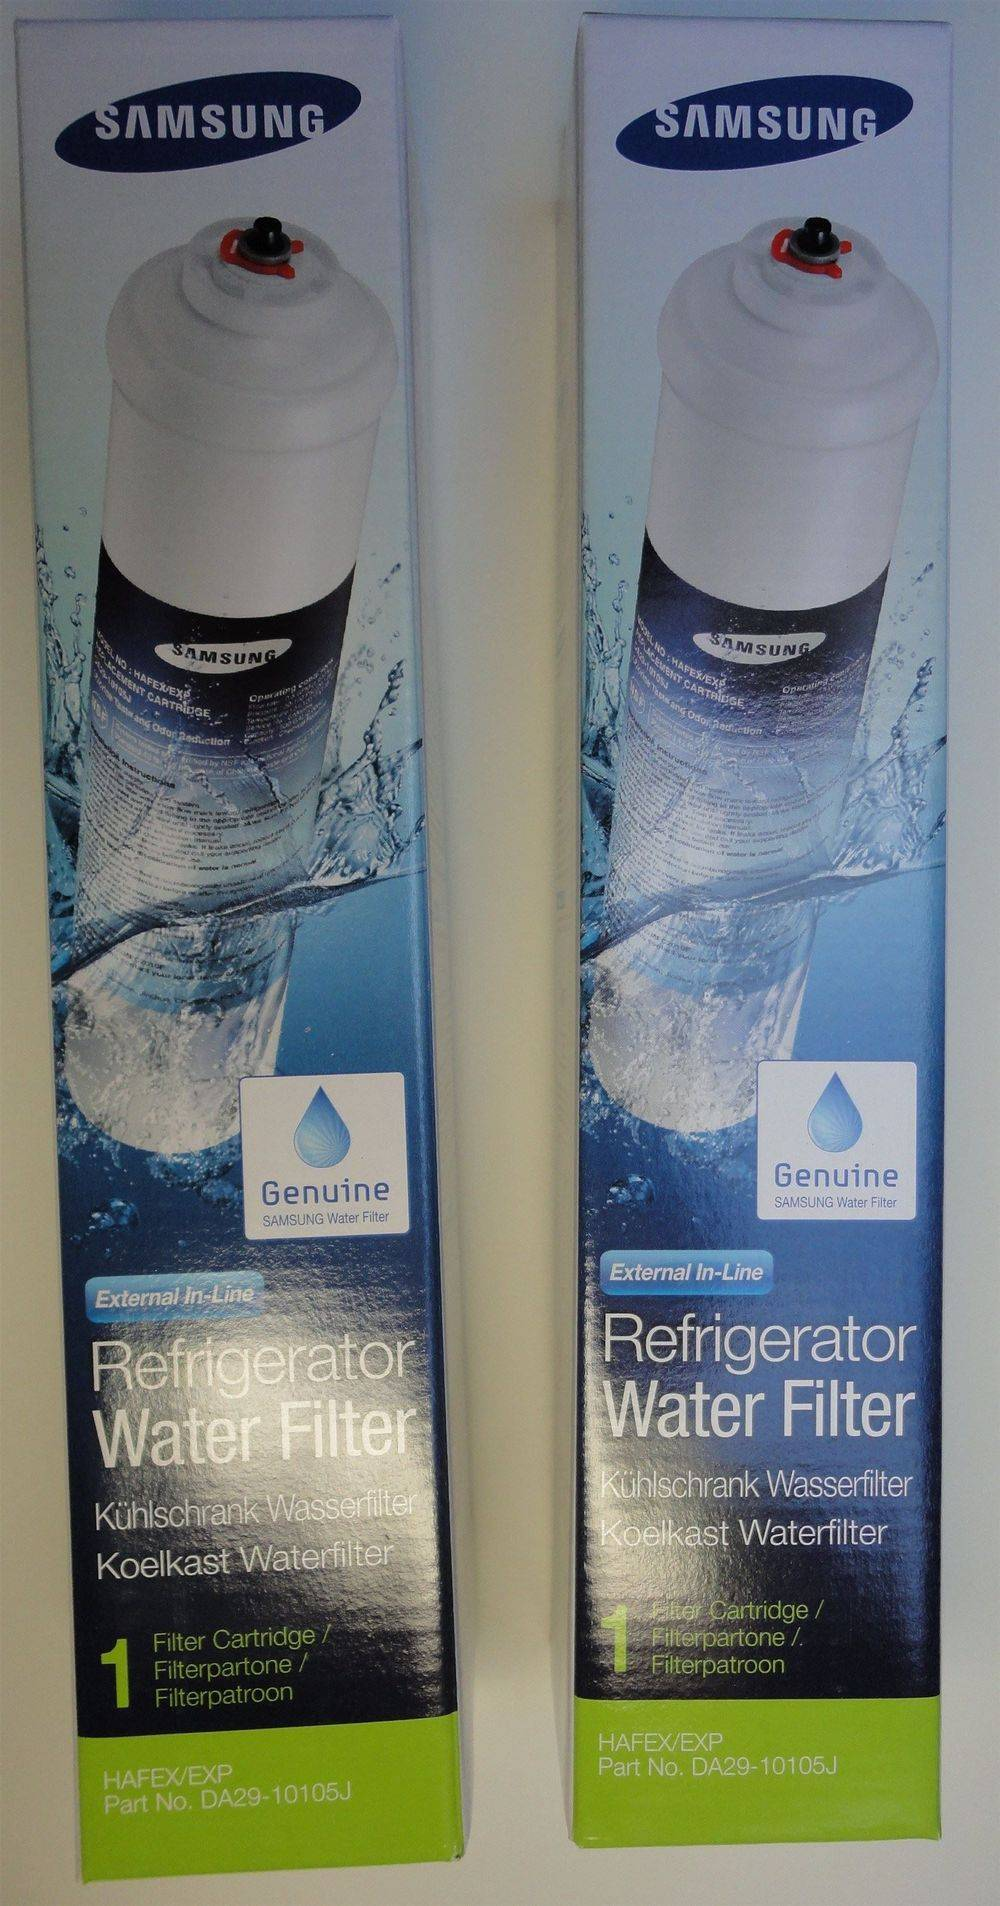 Samsung DA29-10105J & HAFEX/EXP replacement external in-line fridge ice water filter cartridge - www.aaafilterfast.com